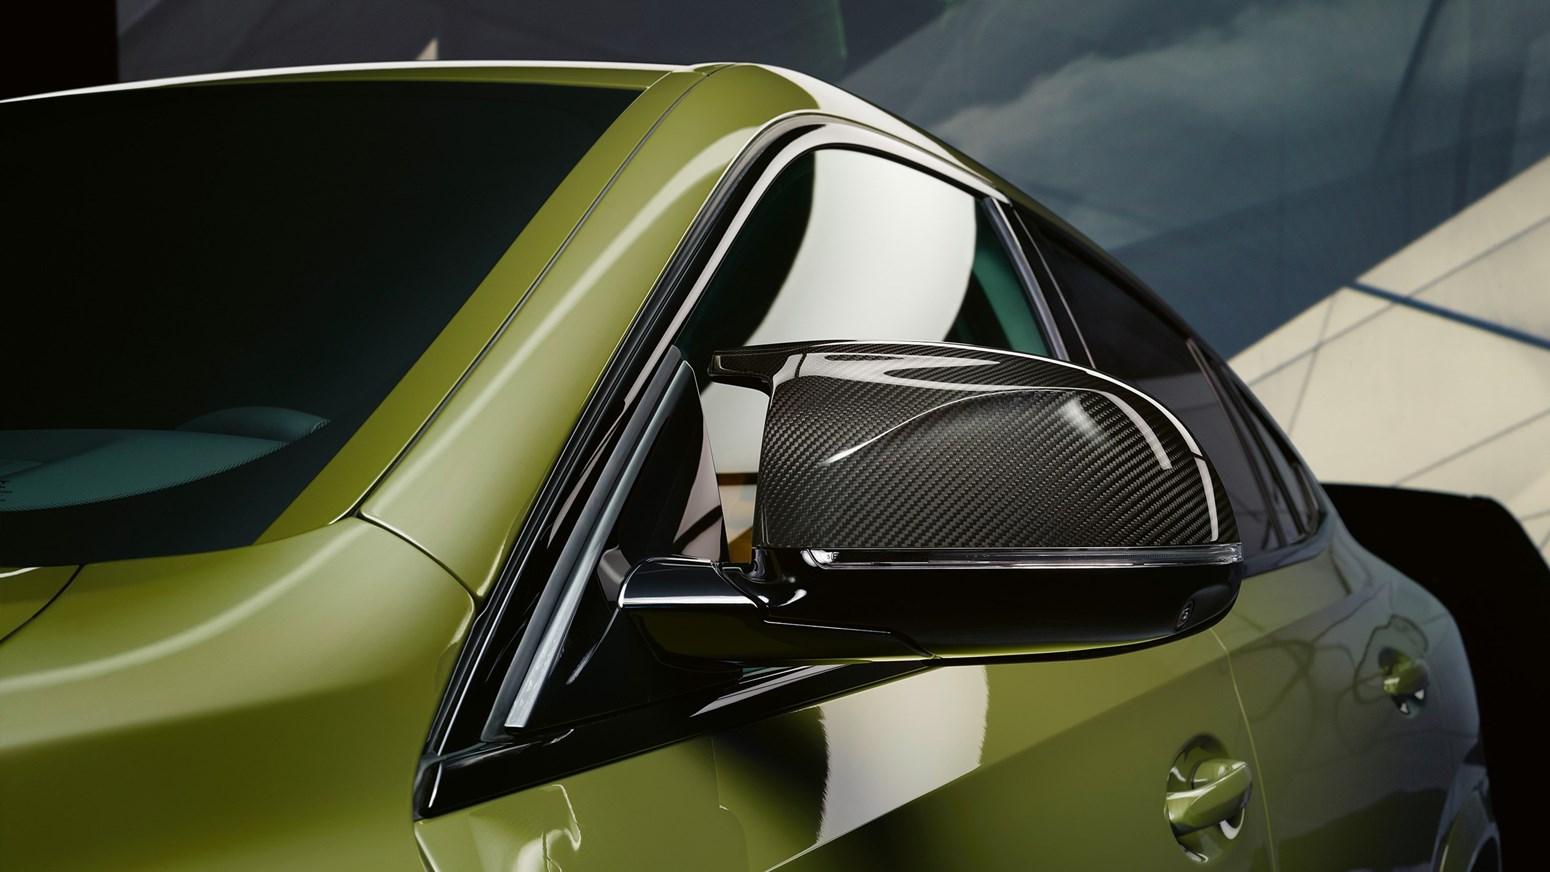 BMW X6 M GALLERY 2440X1373 F